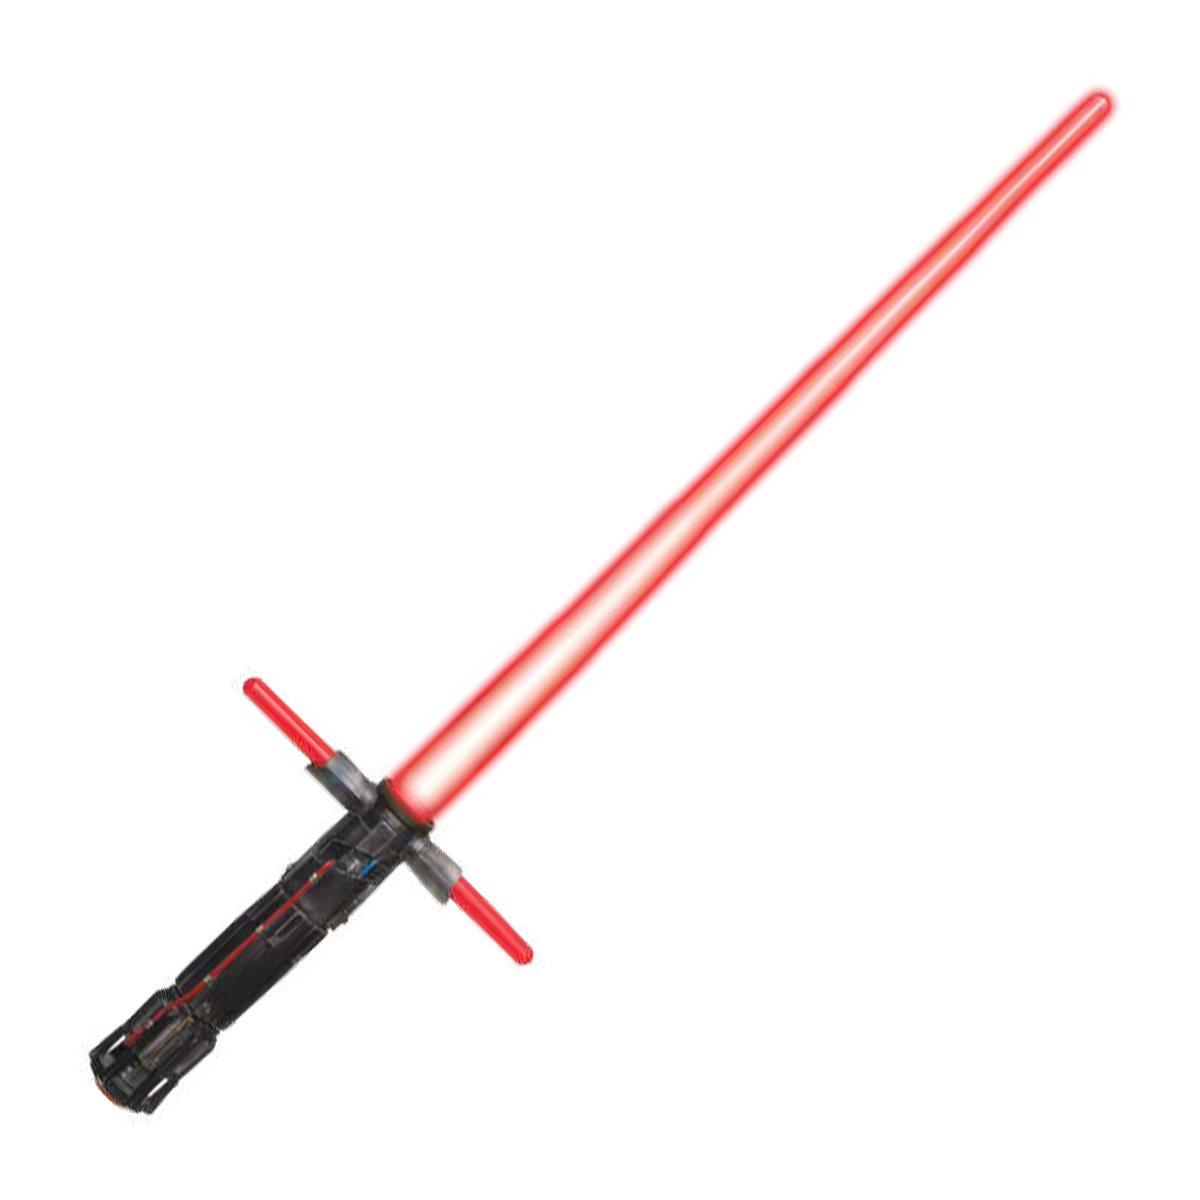 Star Wars The Rise Of Skywalker Kylo Ren Lightsaber Entertainment Earth